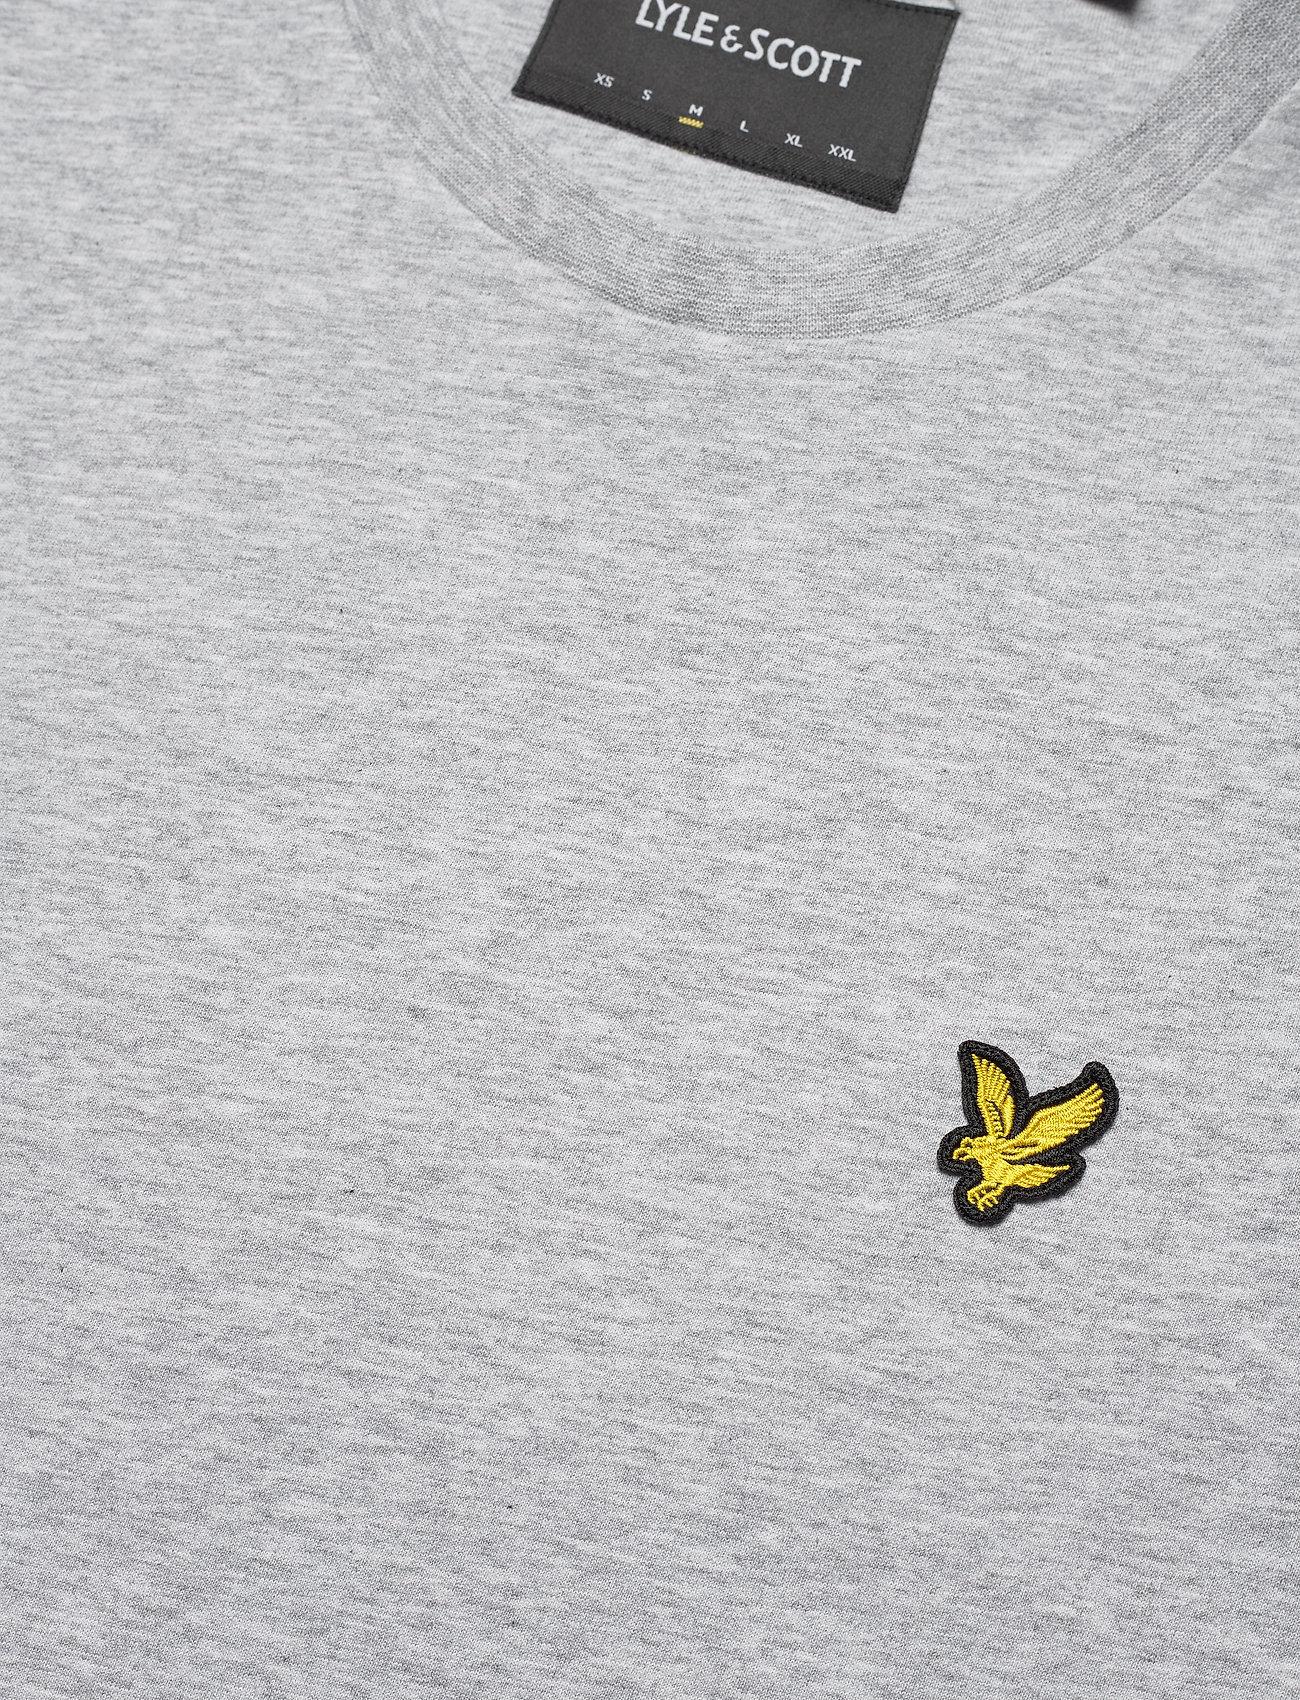 Lyle & Scott - Plain T-Shirt - podstawowe koszulki - light grey marl - 2